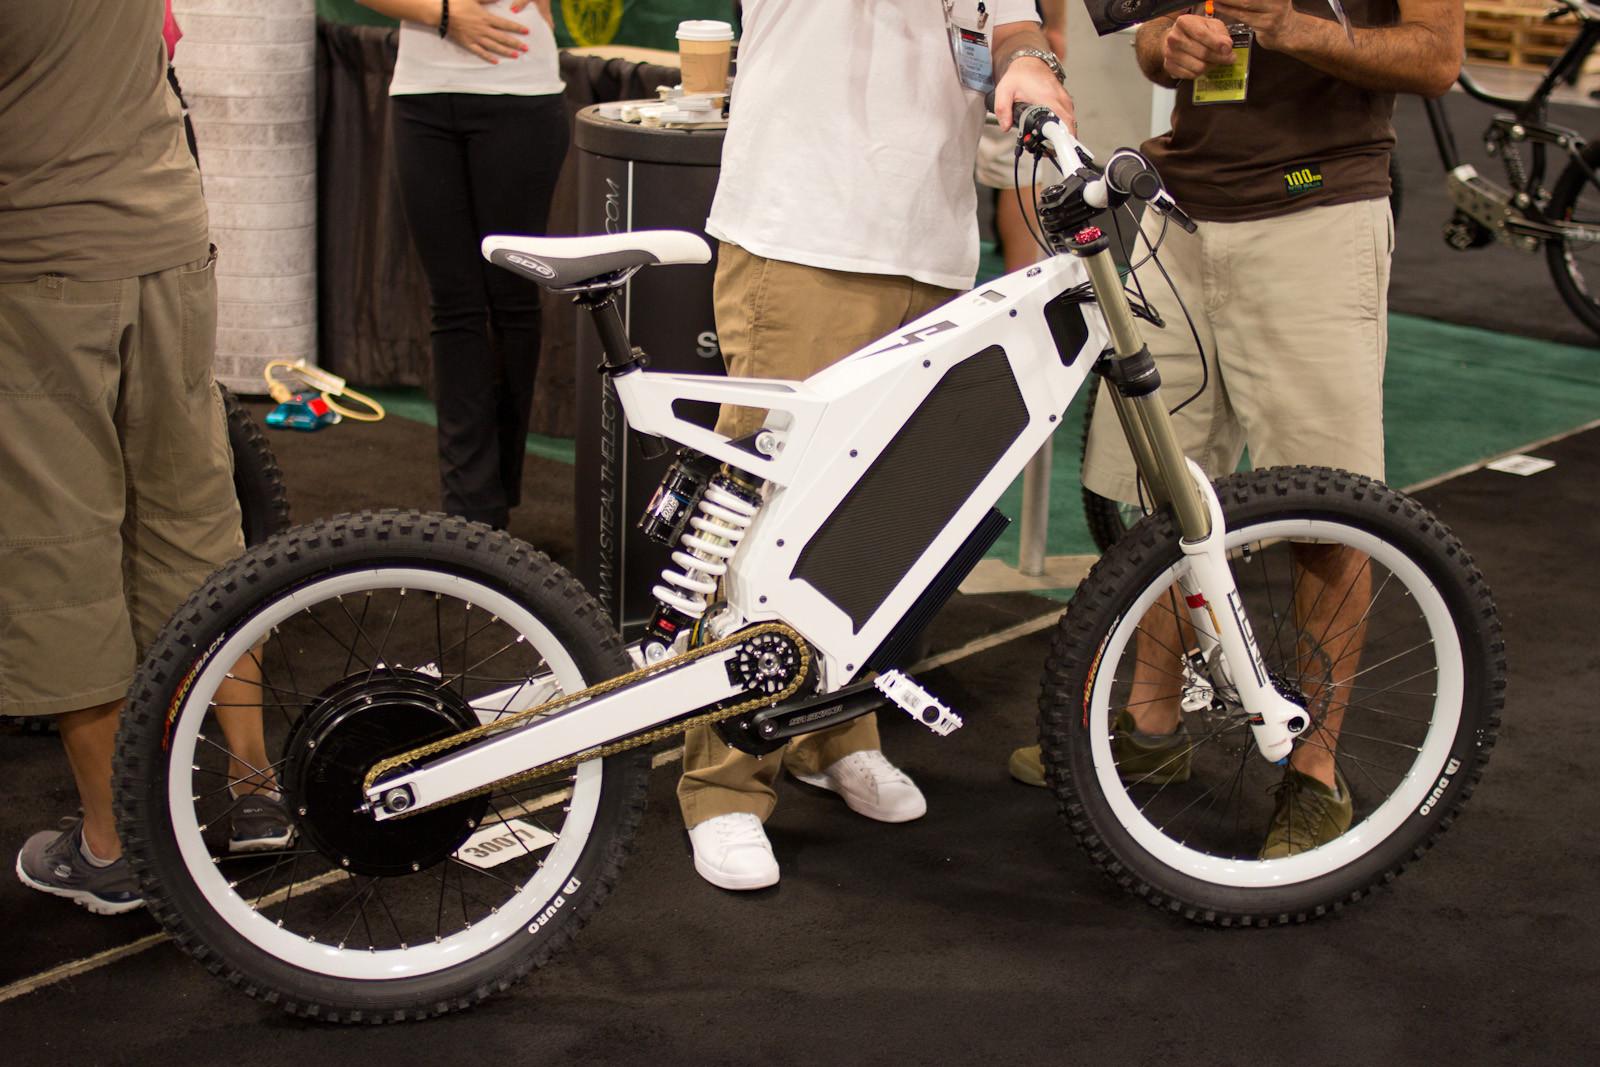 Robo Cop's E-Bike - Random, Wacky, and Weird from Interbike 2012  - Mountain Biking Pictures - Vital MTB